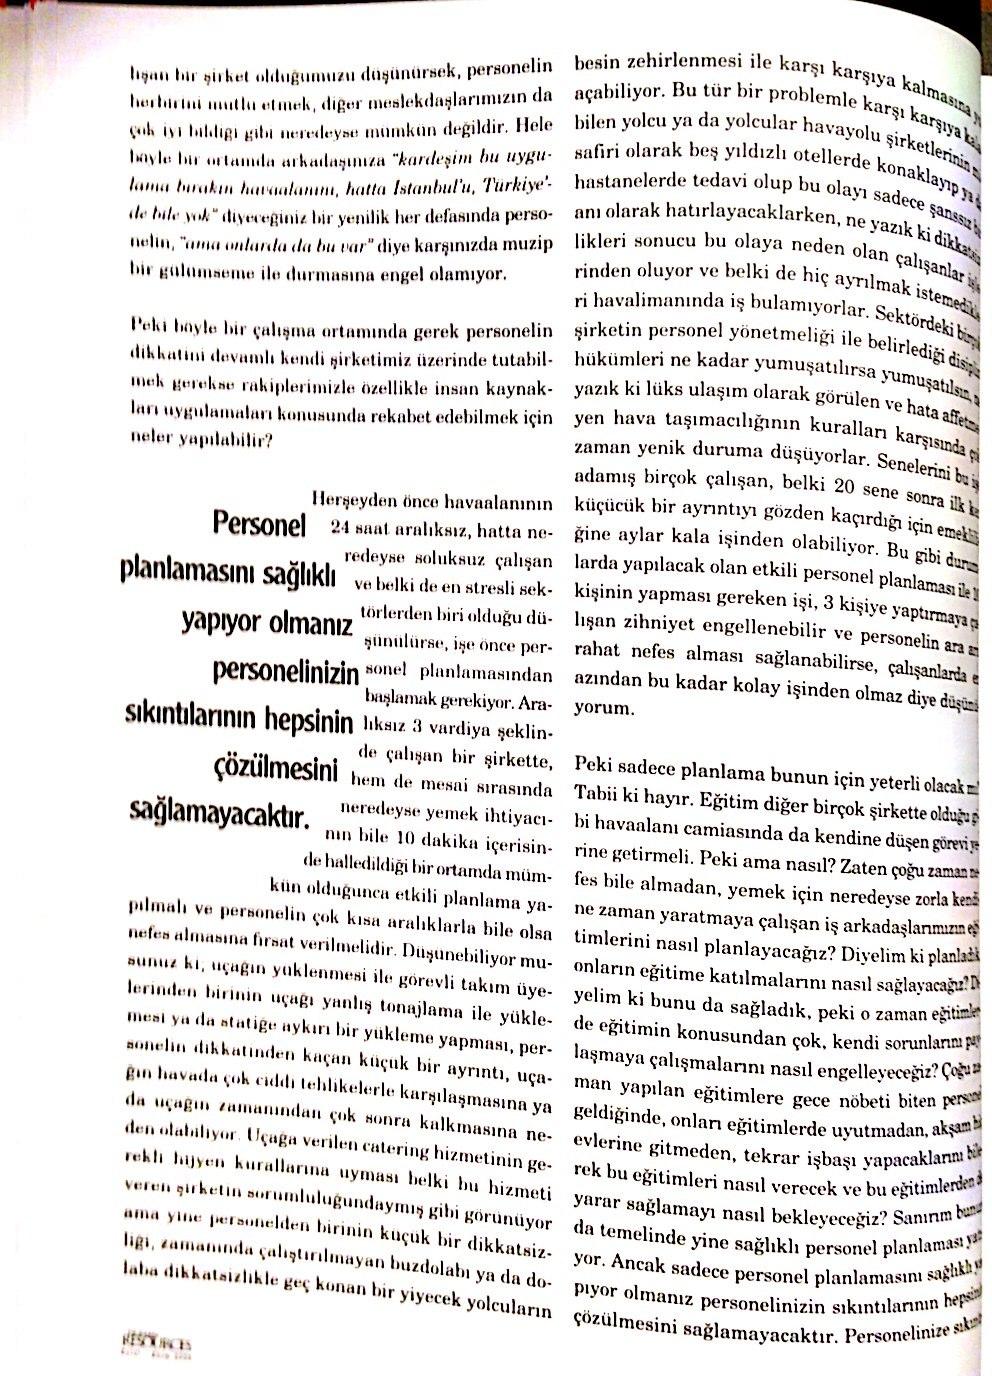 HR+DERGİSİ+EYLÜL+EKİM+2000+2.jpg